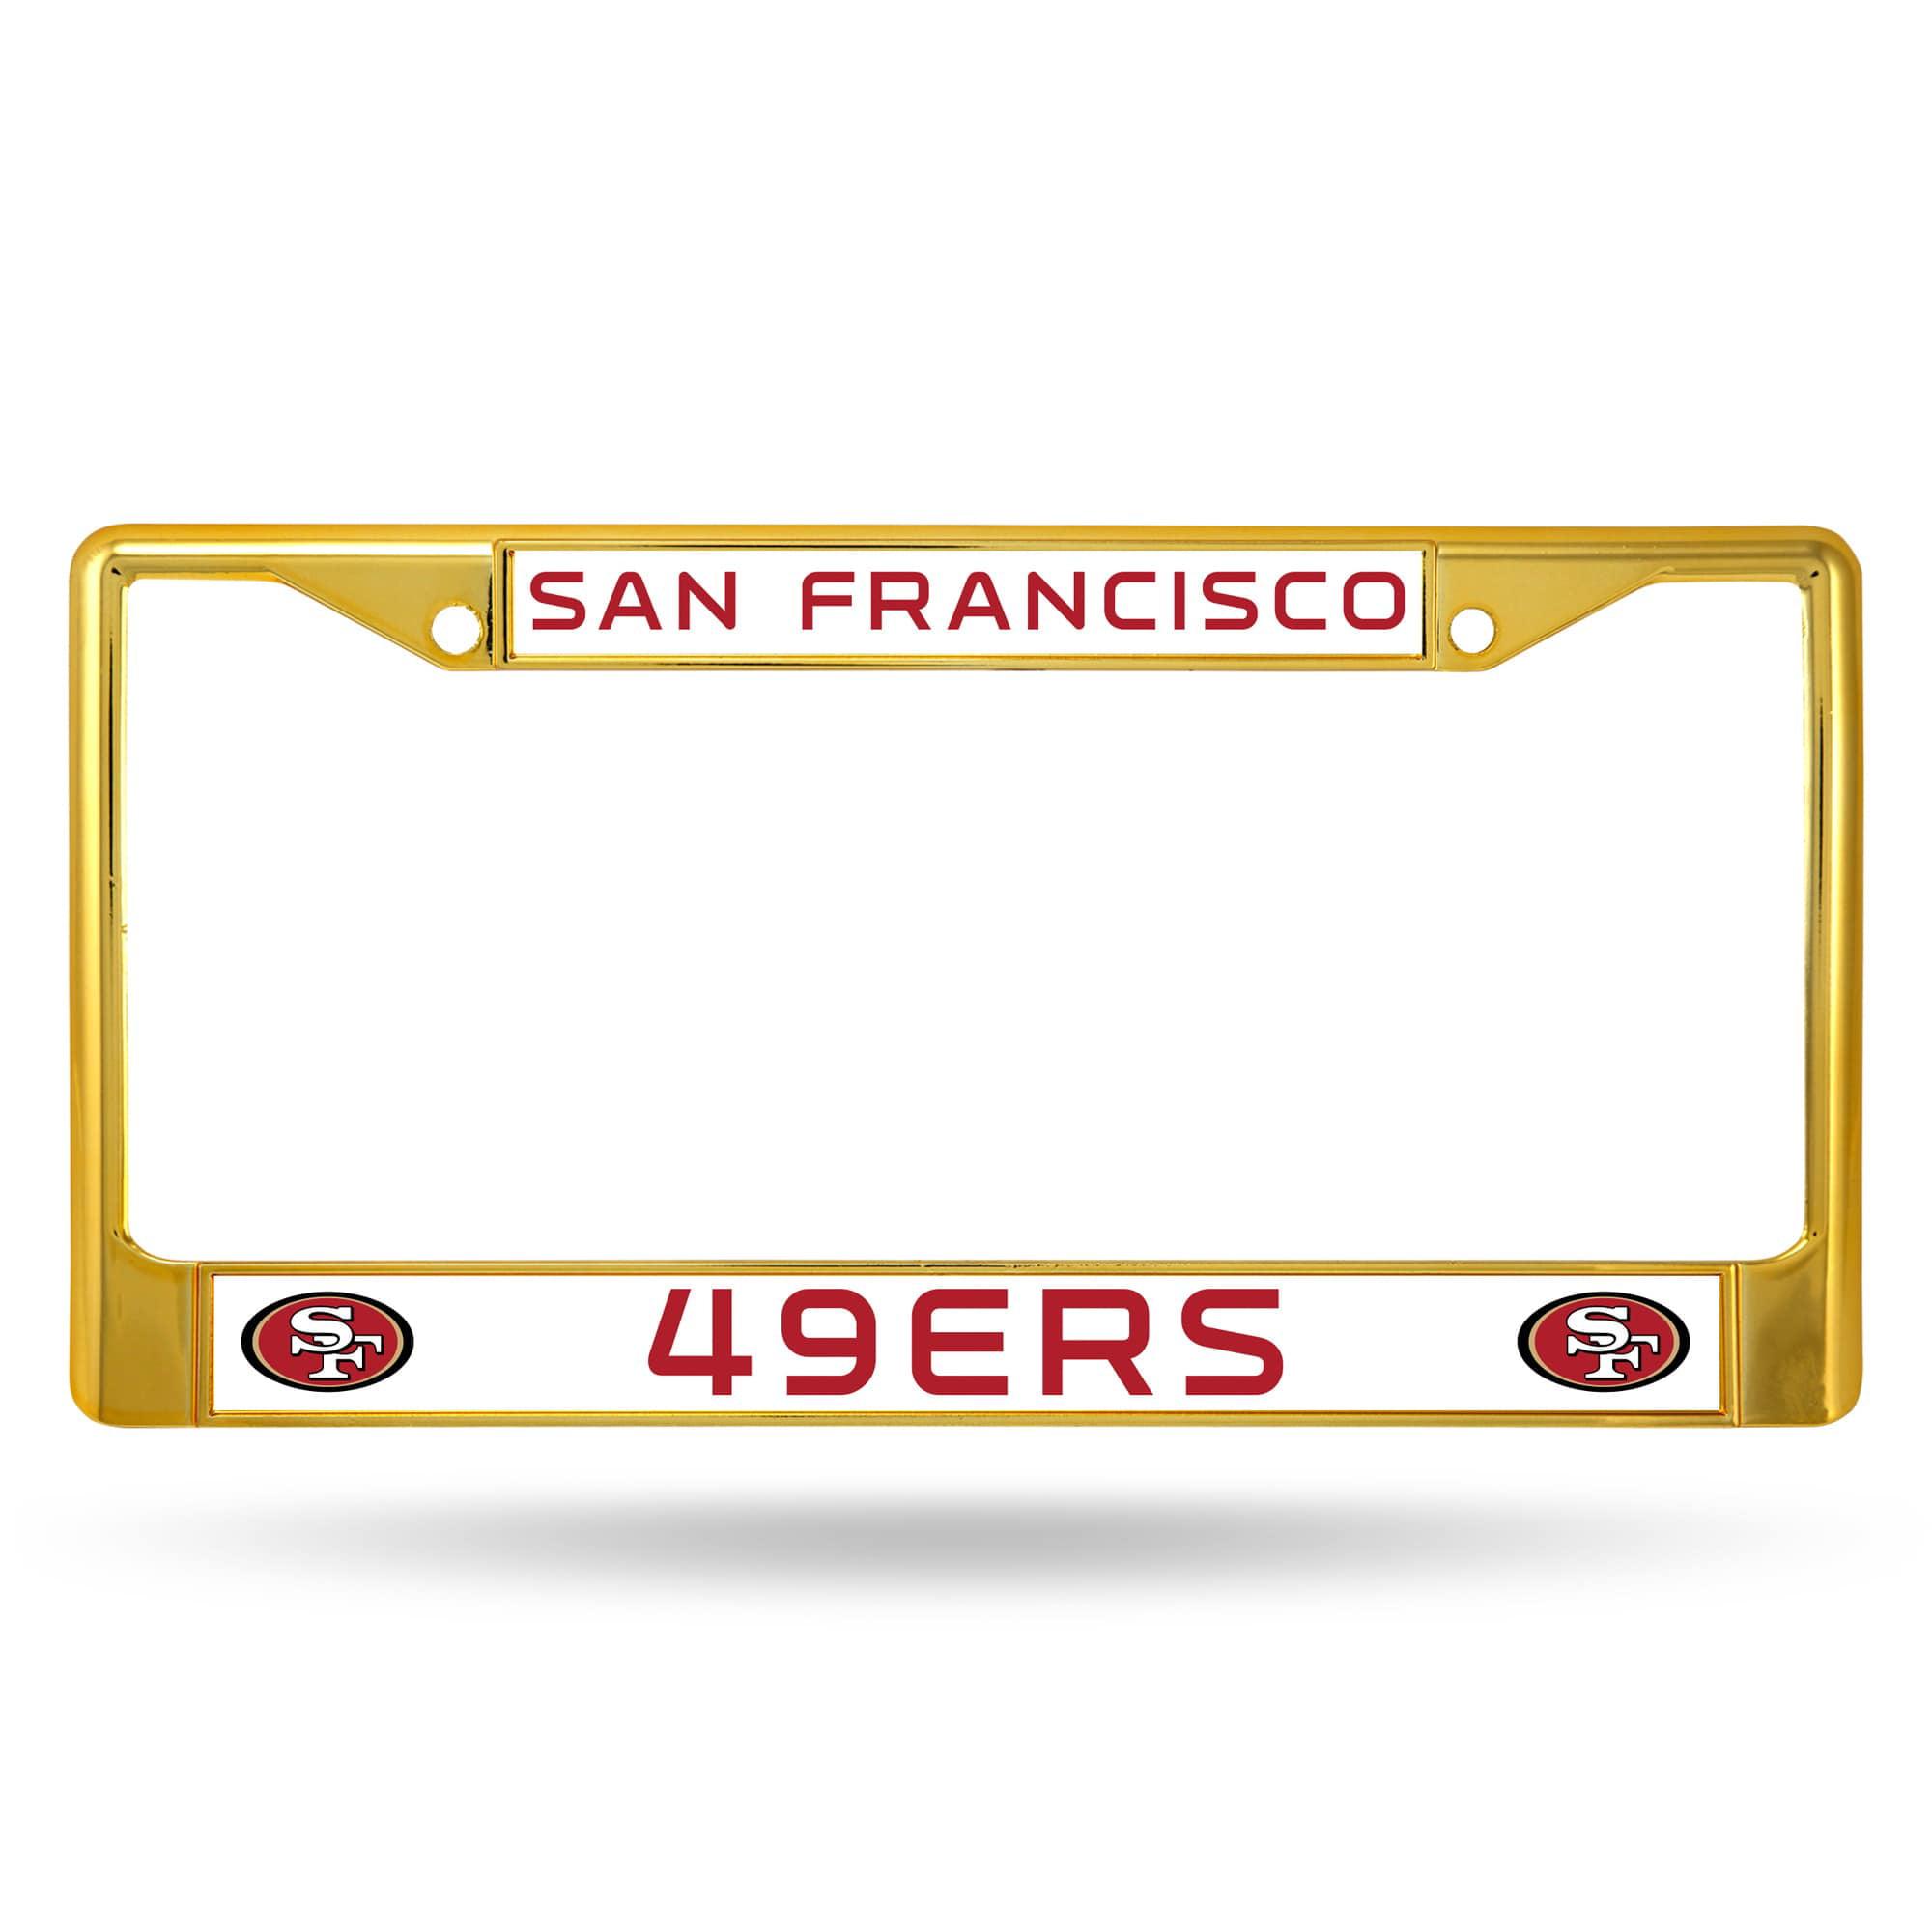 San Francisco 49ers NFL Licensed Gold Painted Chrome Metal License Plate Frame